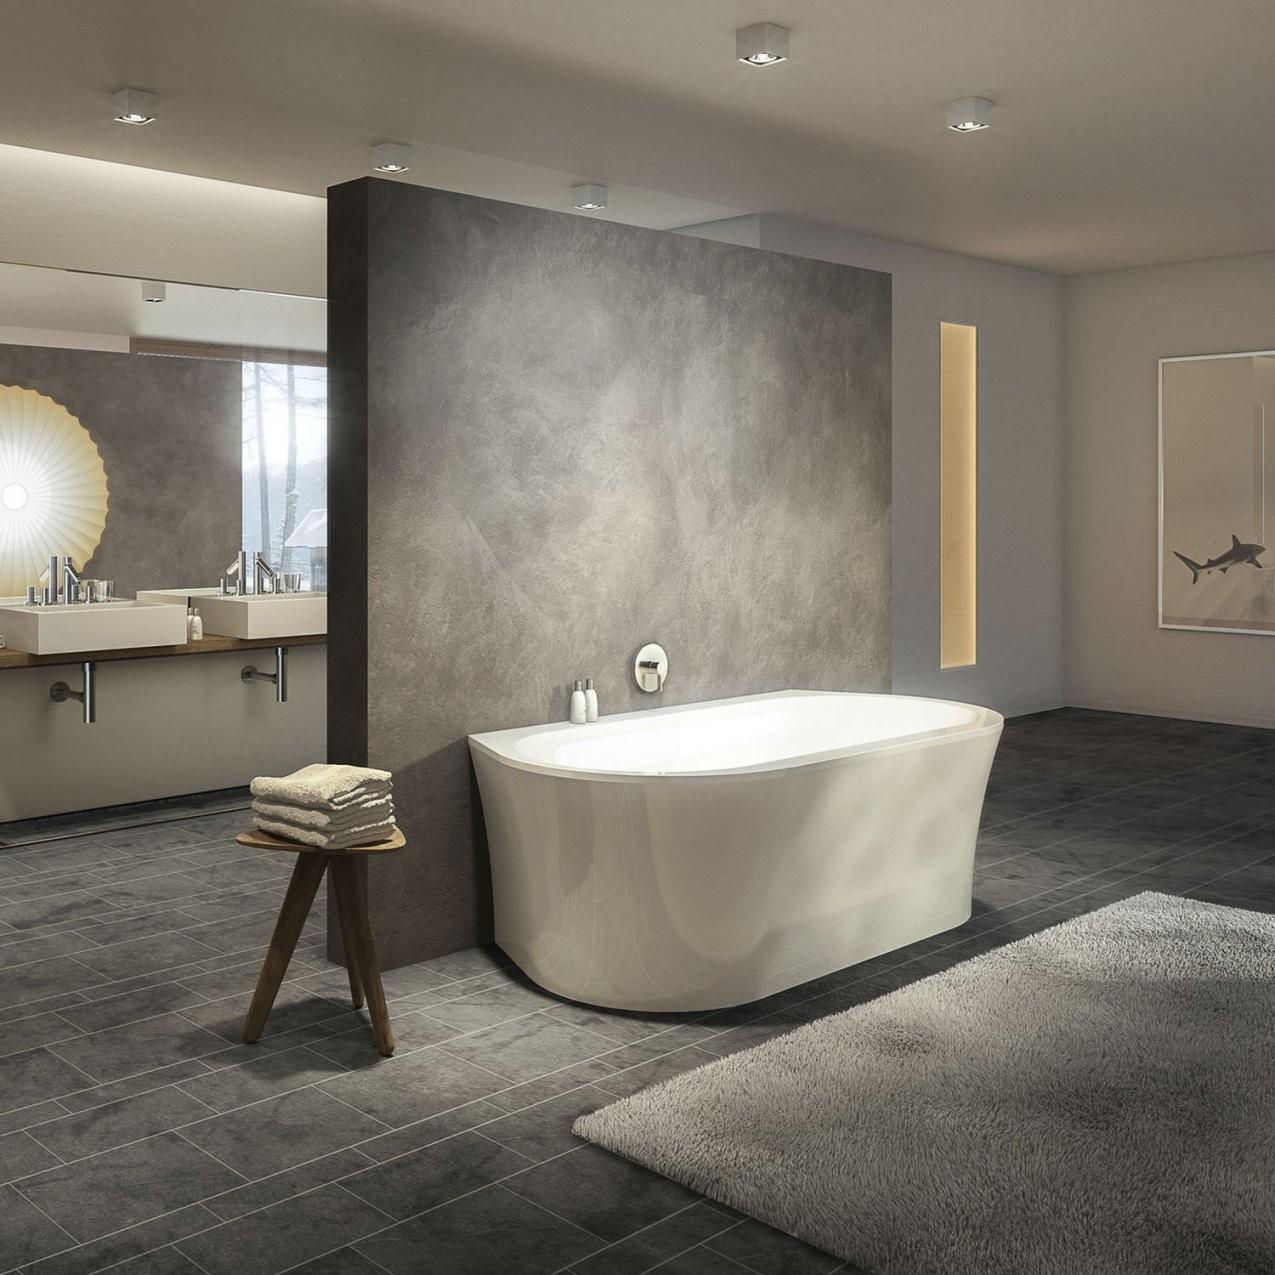 Freistehende Badewanne  Oval  Aus Acryl  Primeline Wall von Halb Freistehende Badewanne Photo